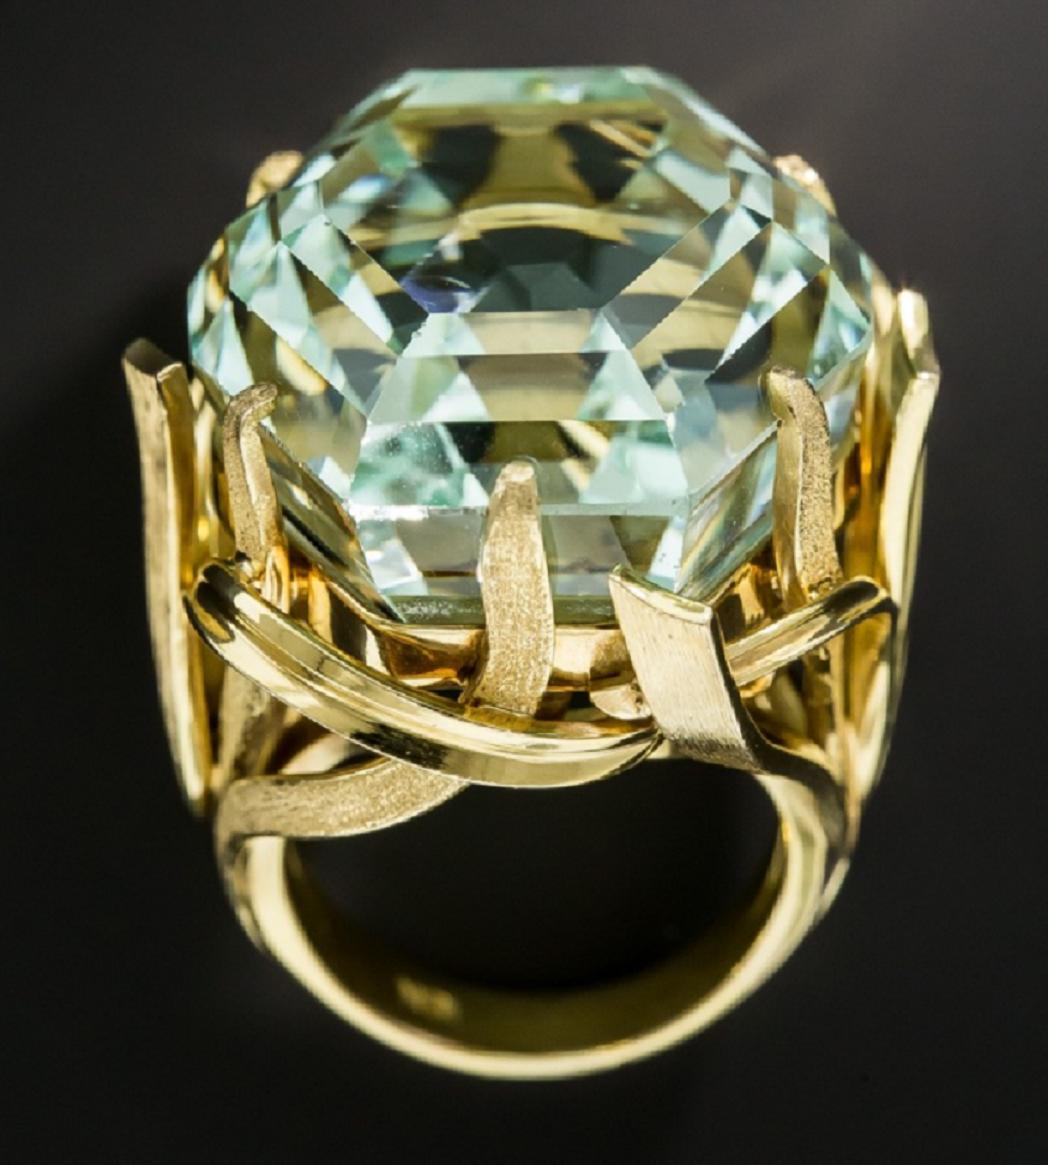 Best massive bling rings 2021 Elegant 70 carat , Enchanting Hexagonal Minty Green Gemstone Enveloped In Flowing Ribbons 18K Yellow Gold Ring